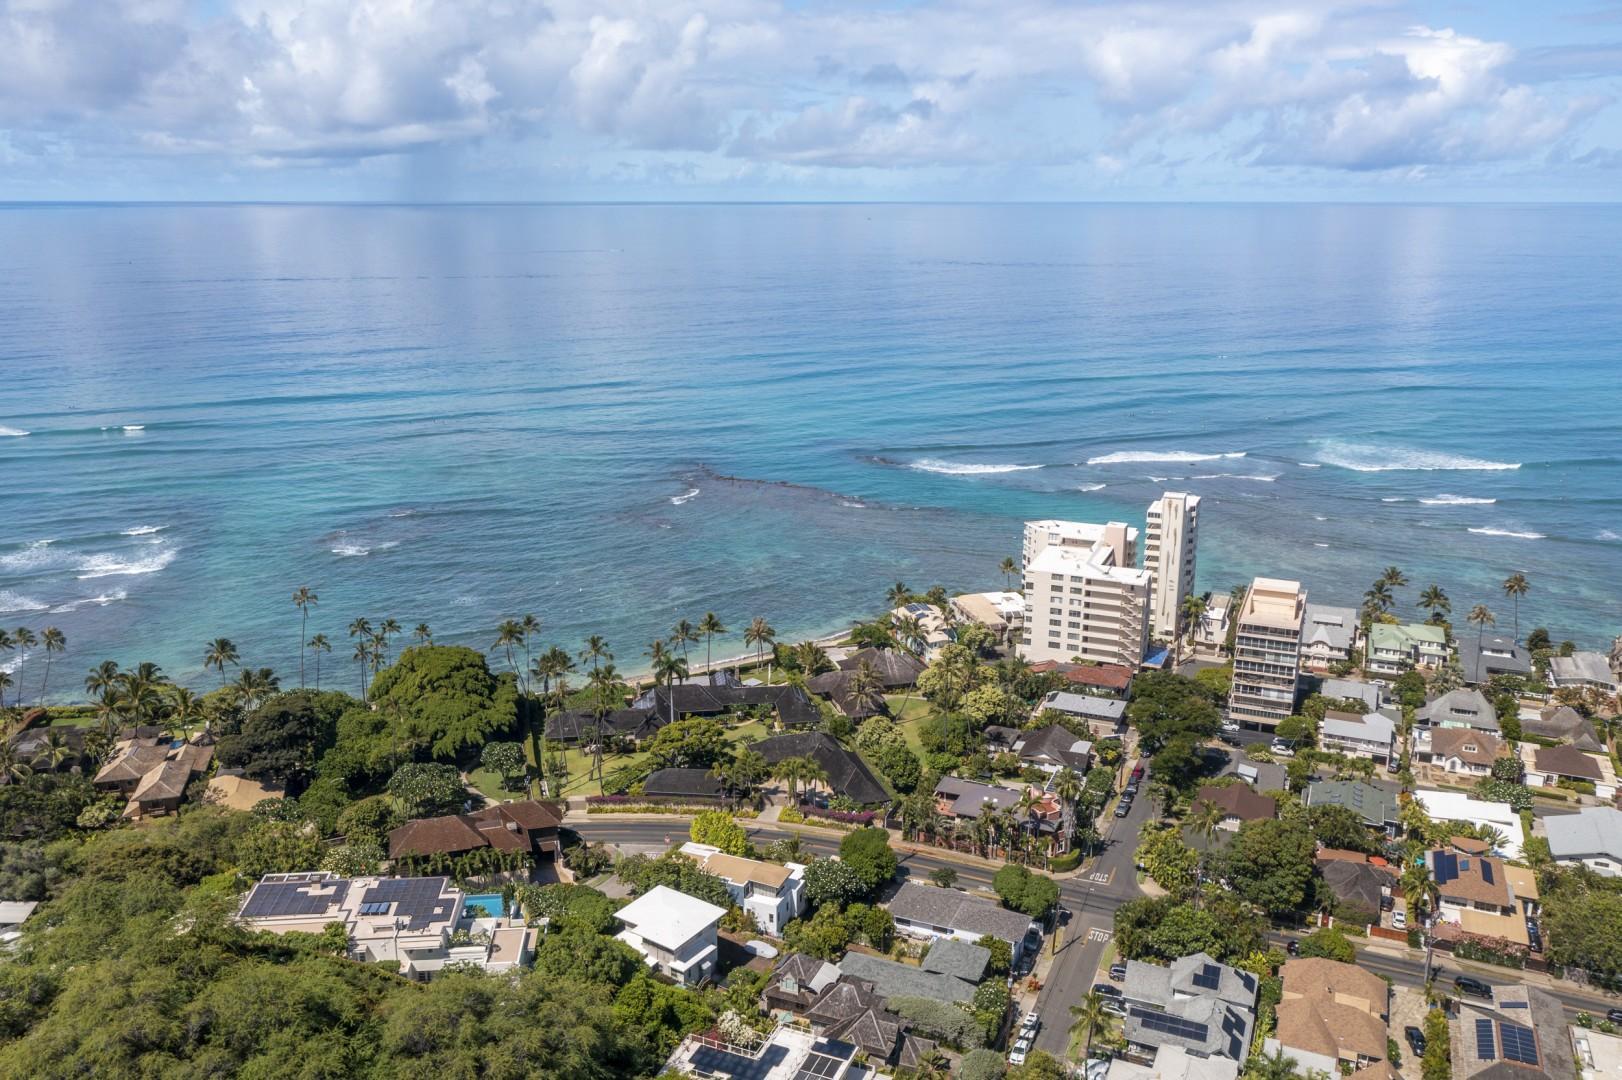 Located near the surf break Tongs